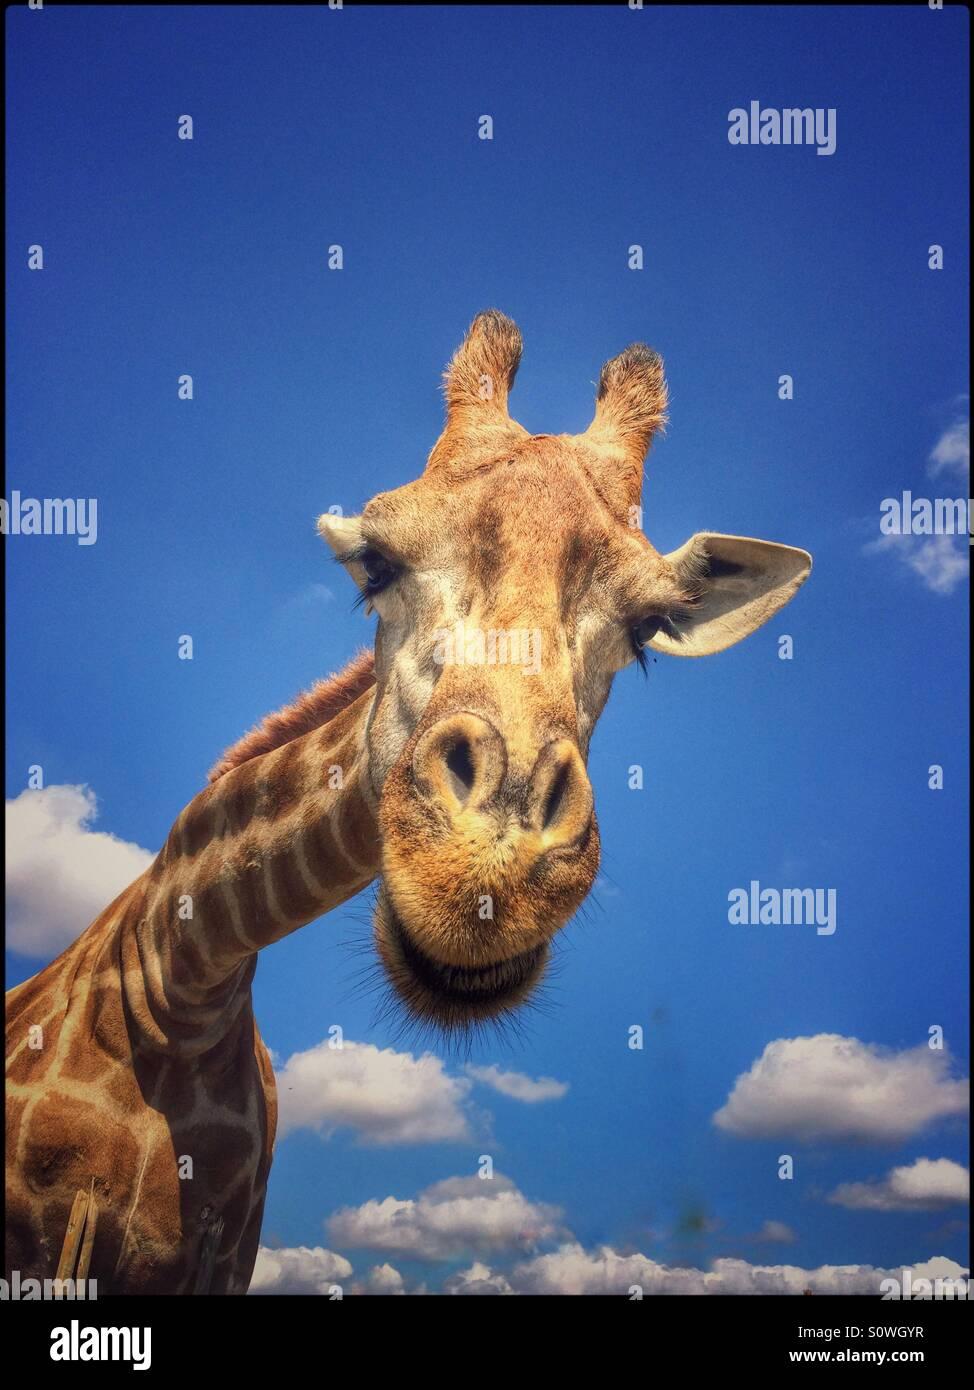 Giraffa. Immagini Stock